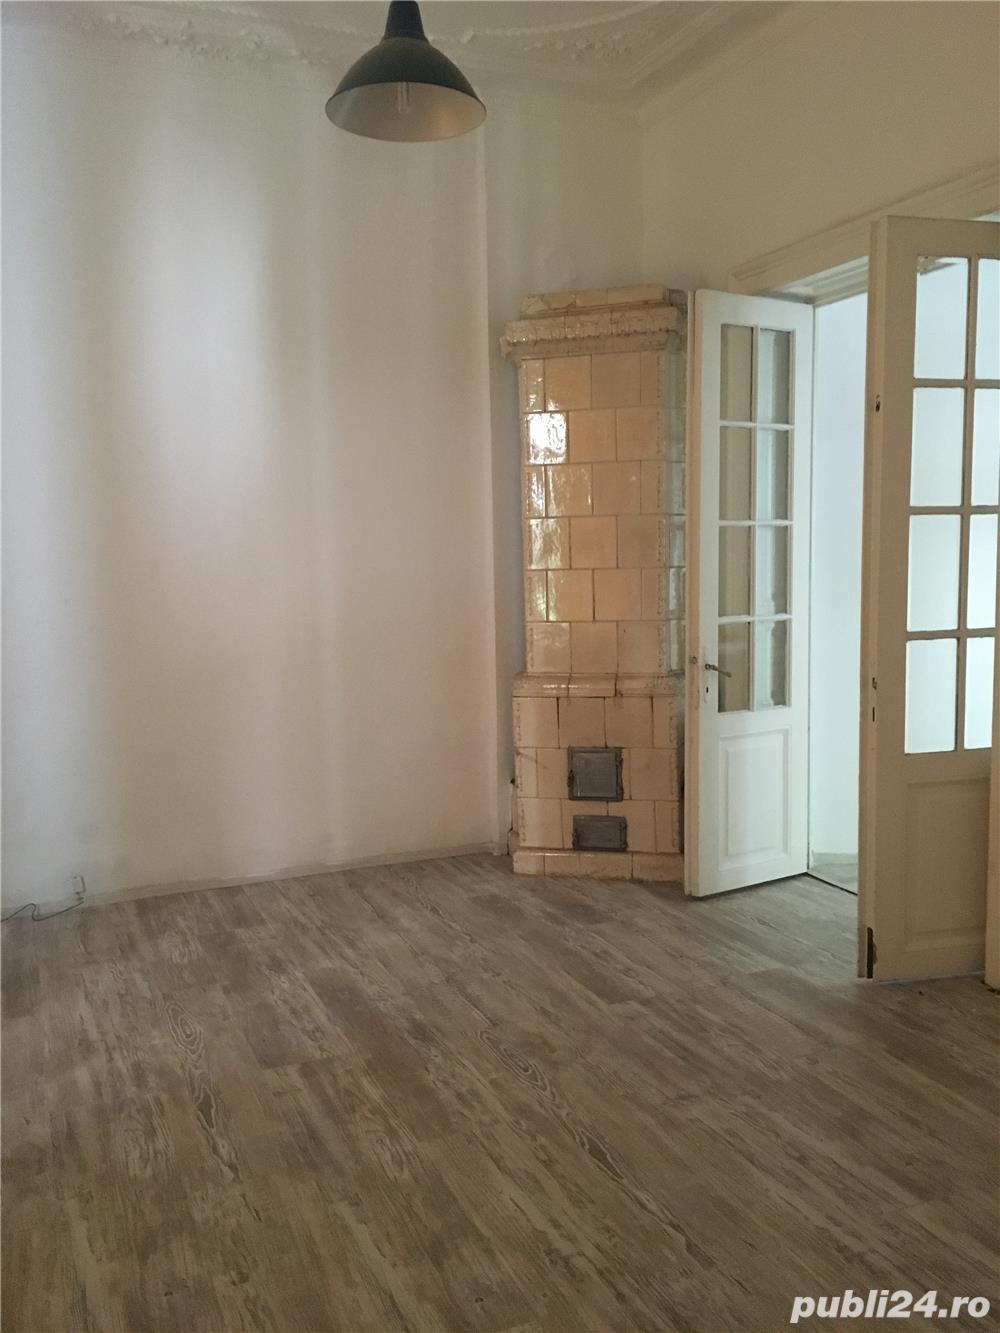 Ideal pentru firma, birou sau rezidential, inchiriere apart.3 camere, zona Polona